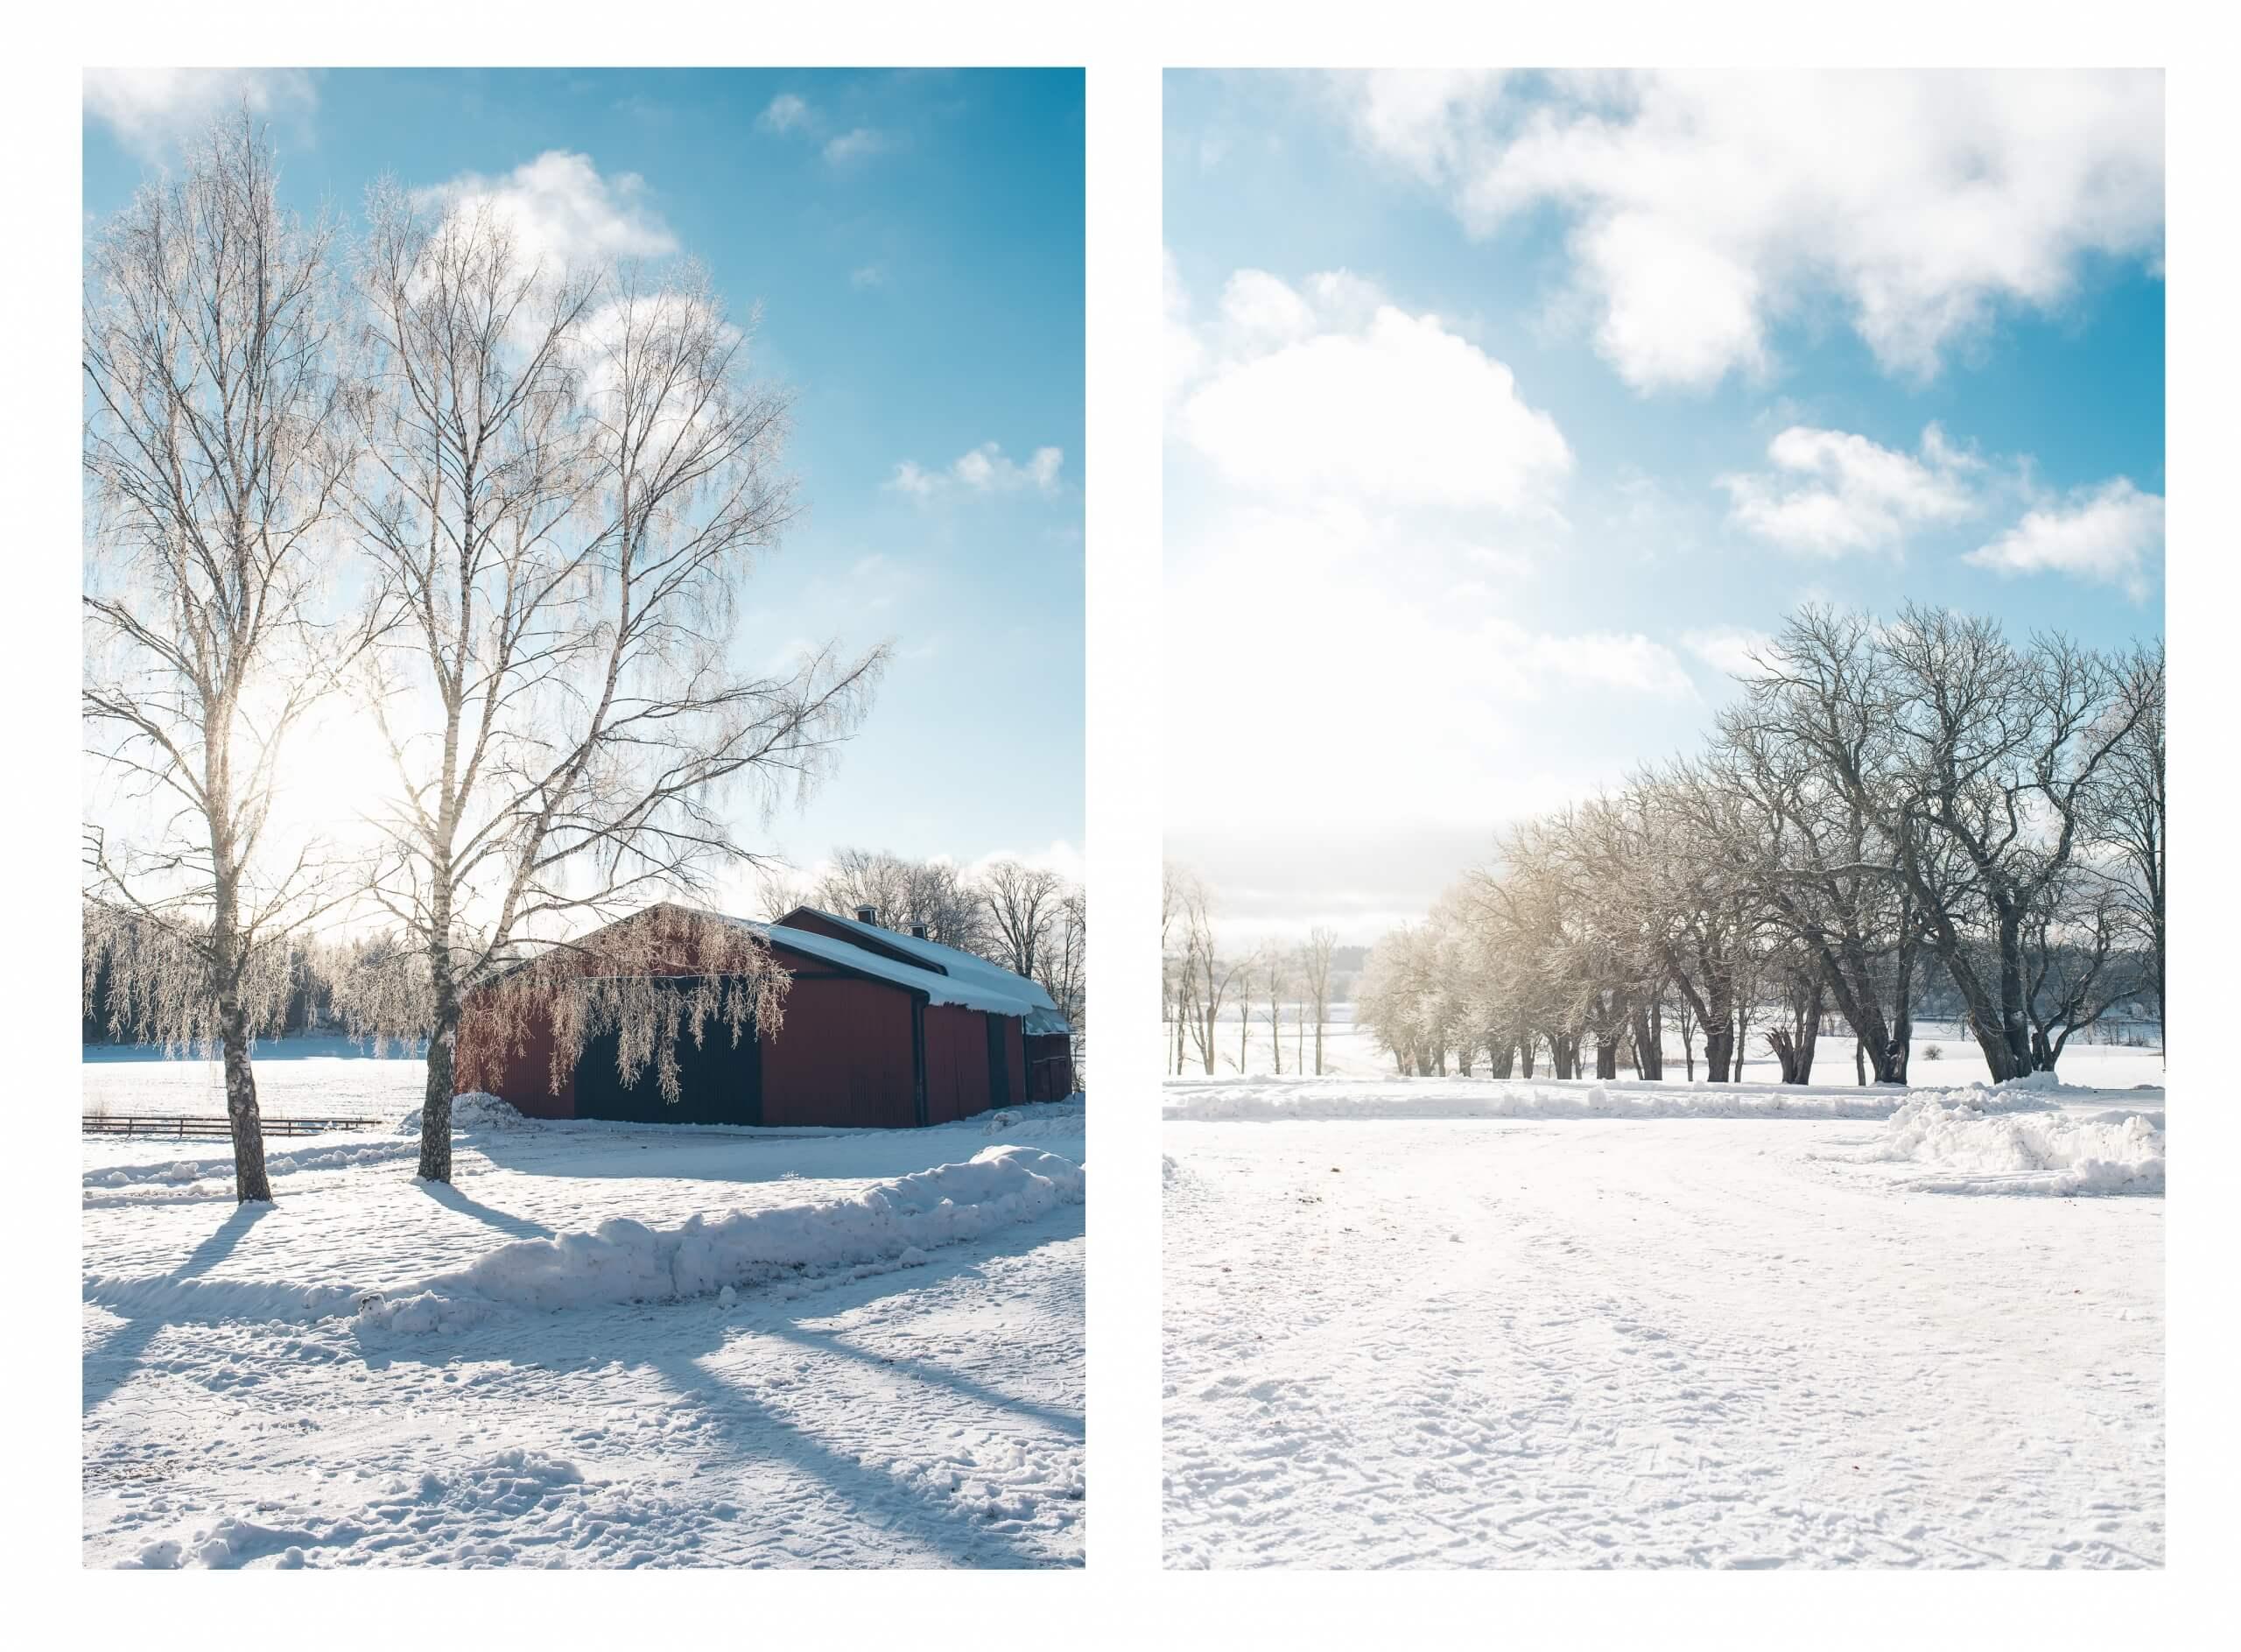 janni-deler-horses-snowDSC_6573 copy